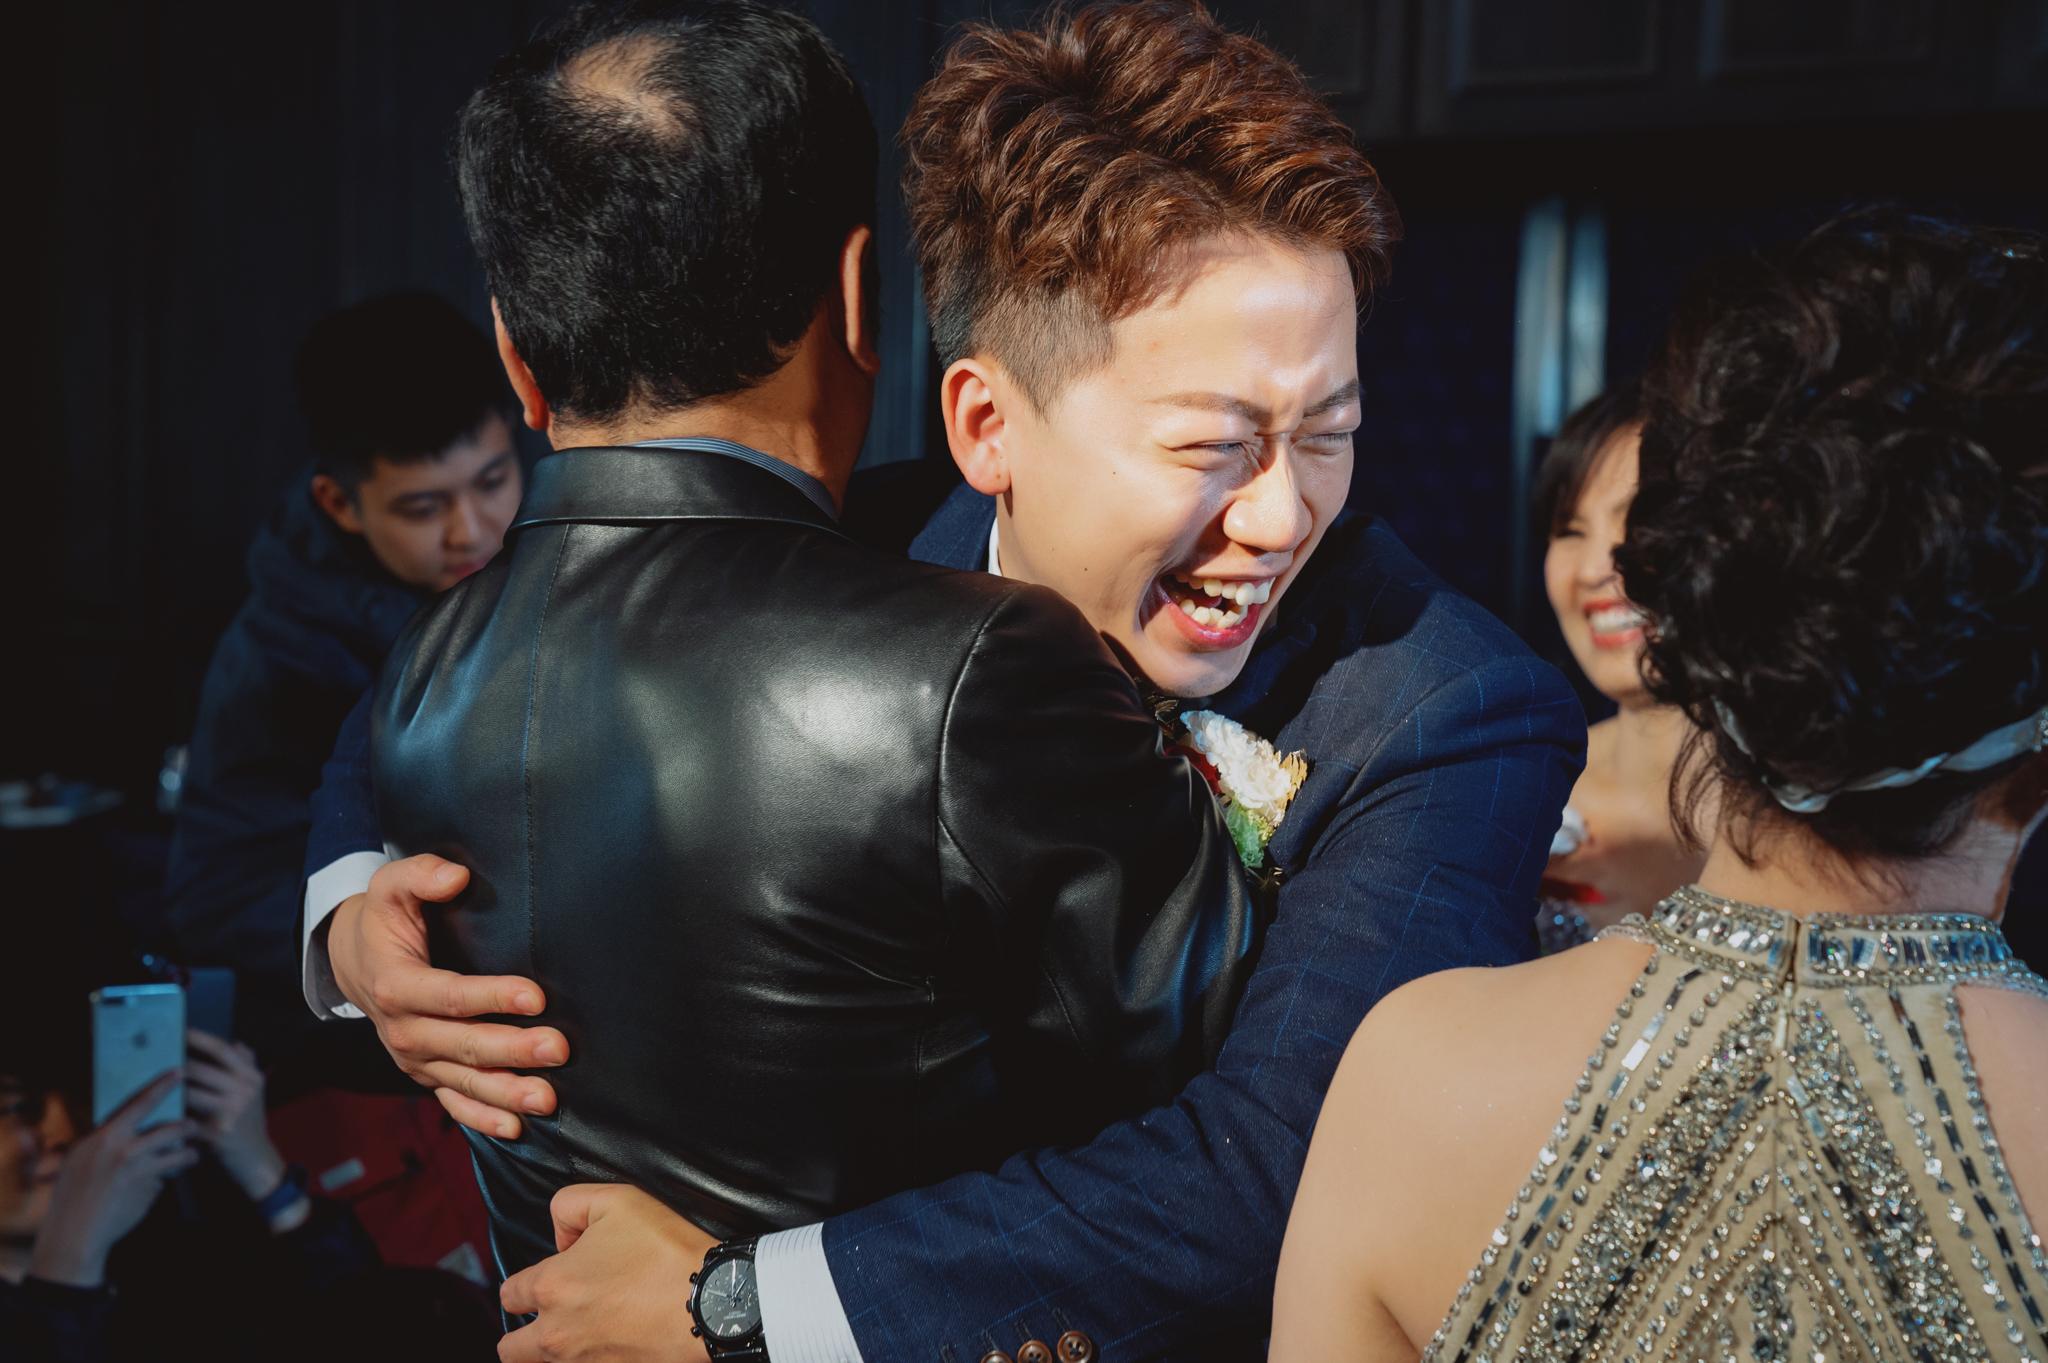 Donfer, 東法, EASTERN WEDDING, Niniko, 君品酒店, 藝術婚禮, 台北婚攝, 婚禮紀錄